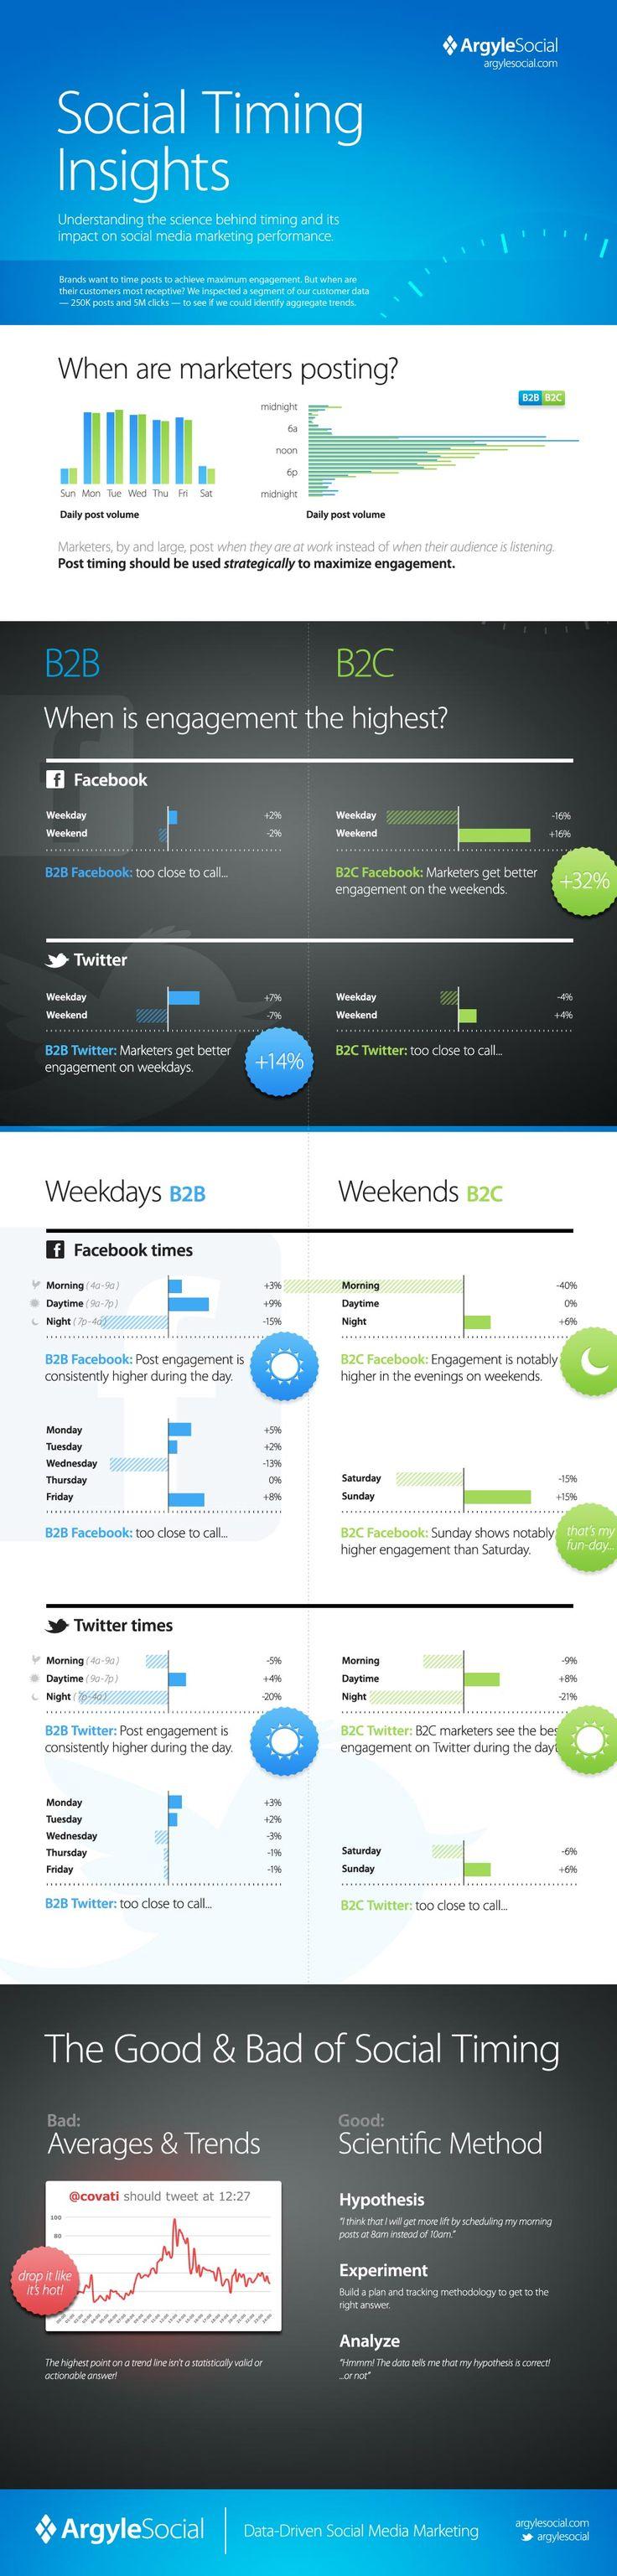 Timing en #SocialMedia via @vmdeluxe #RedesSociales #Marketing #SMM